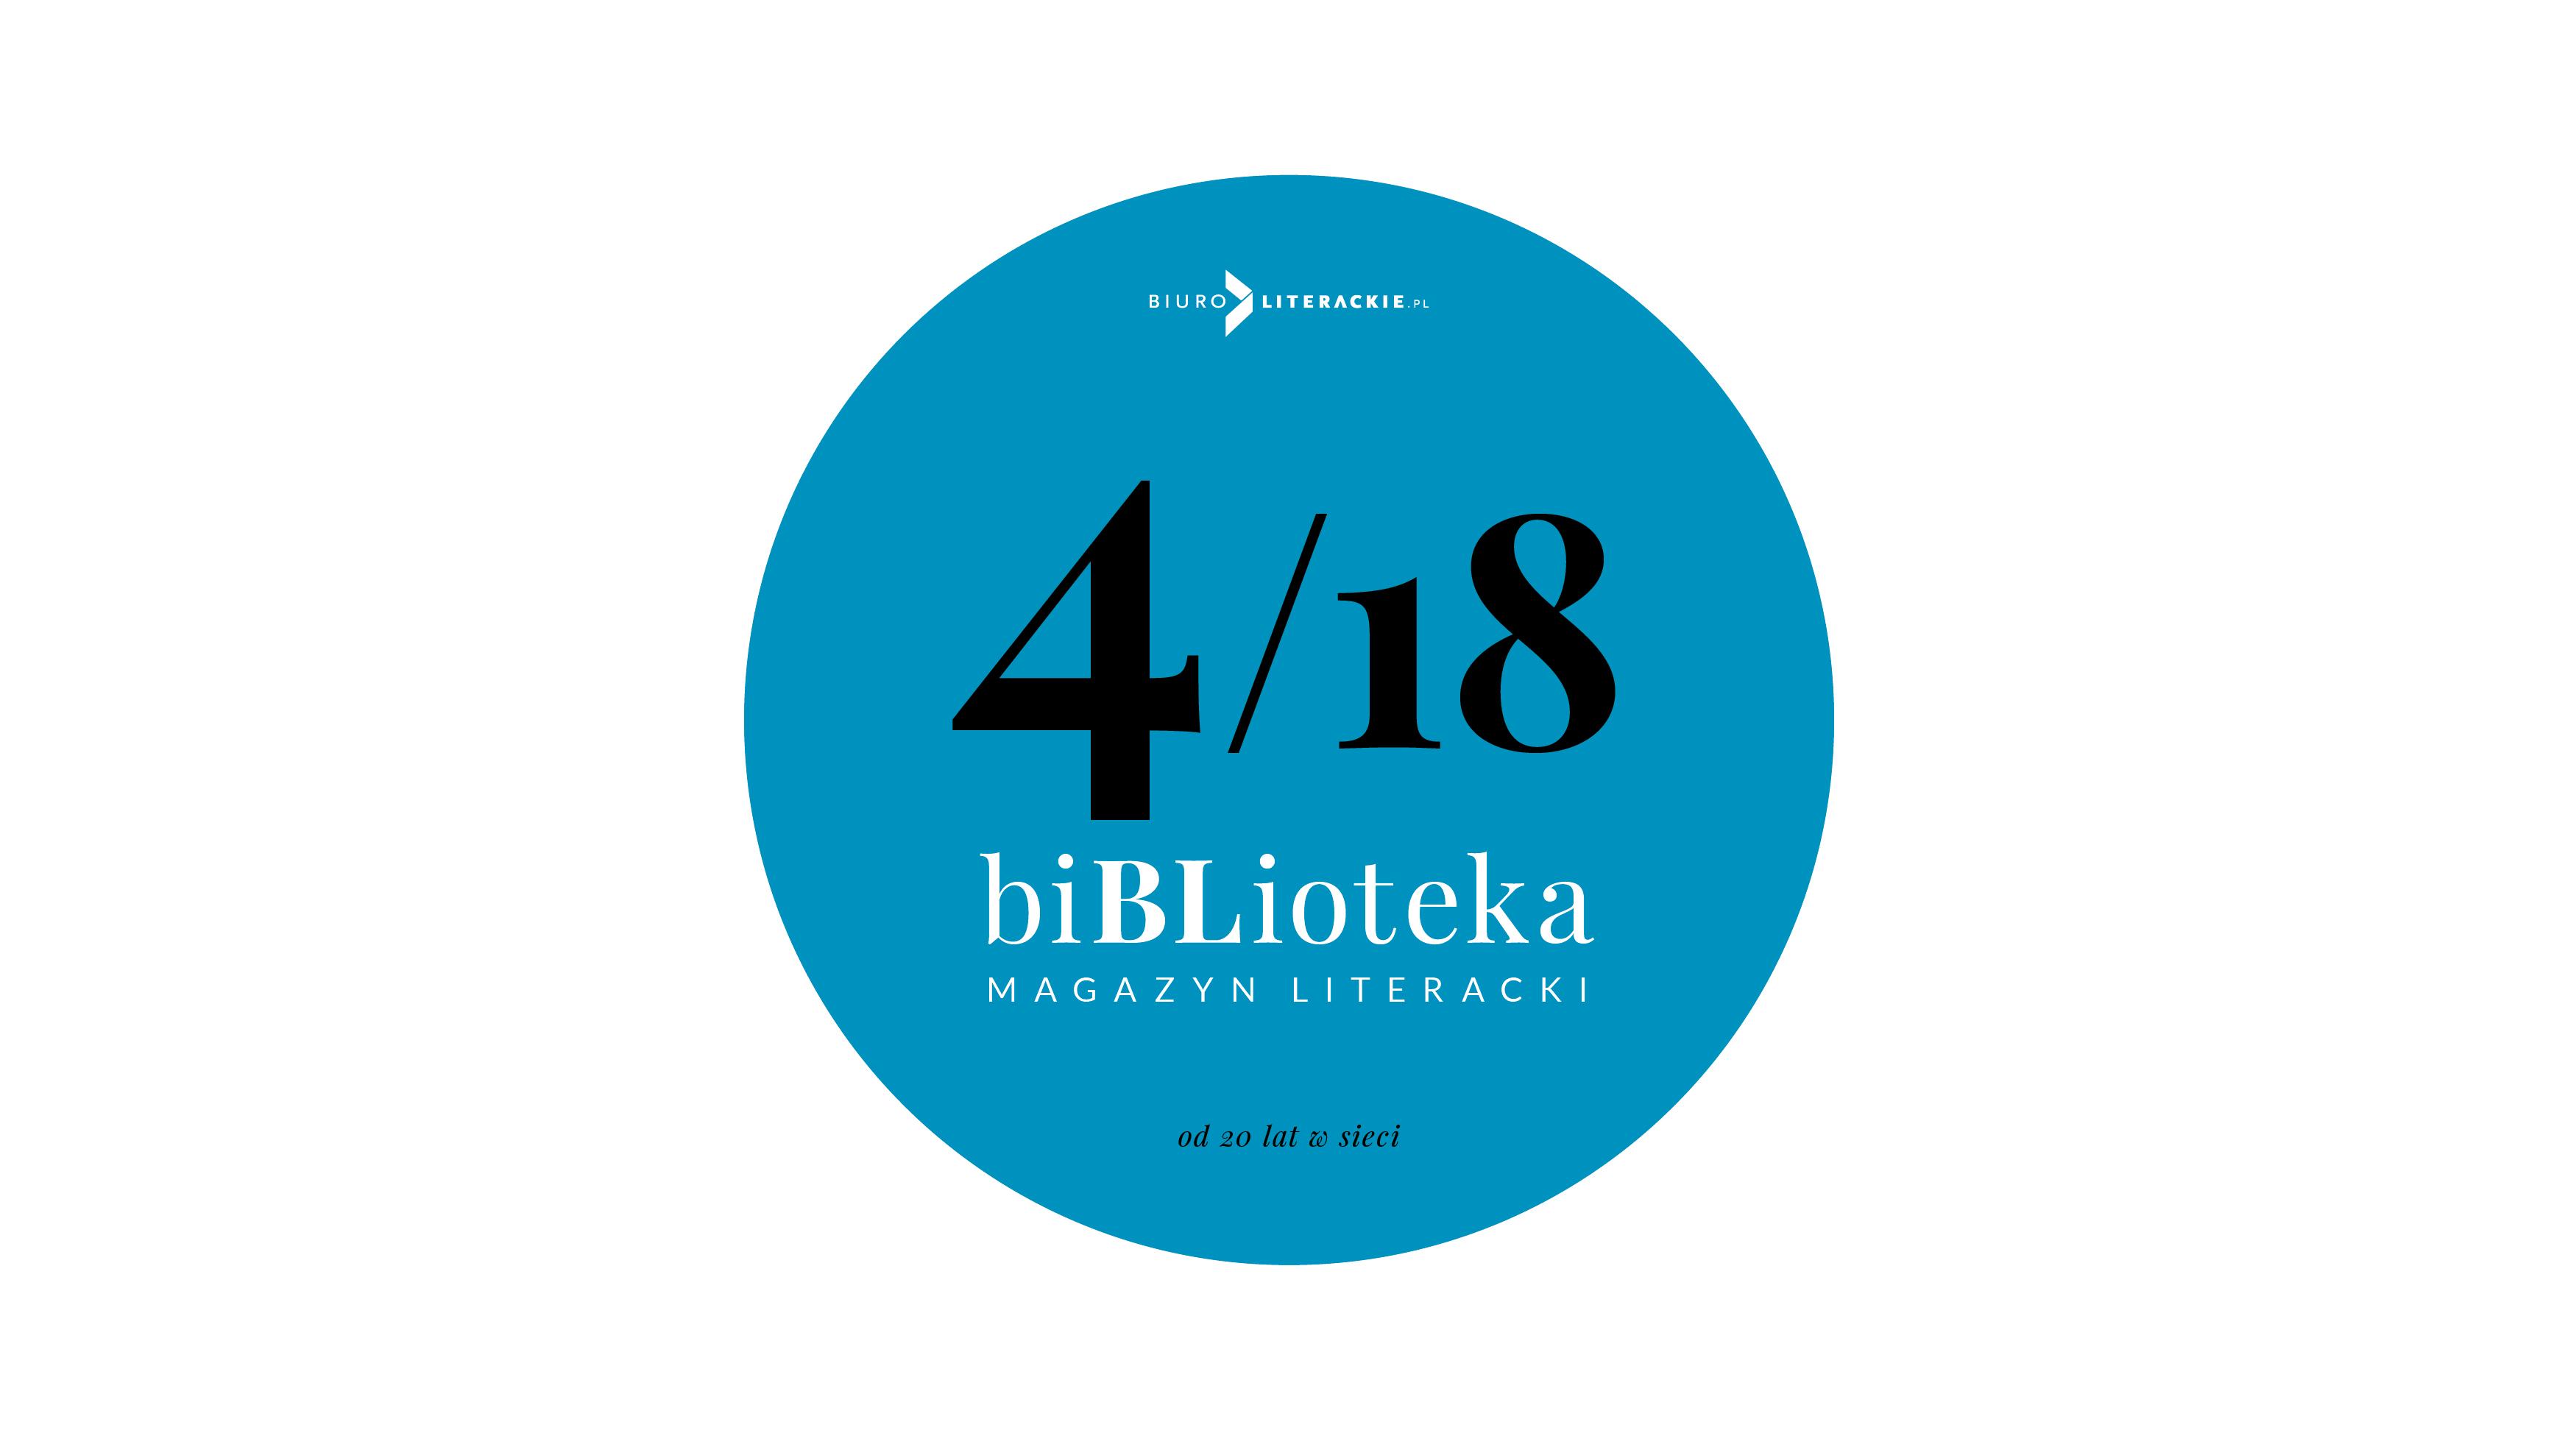 BL Img 2018.03.20 biBLioteka nr 4__www_top